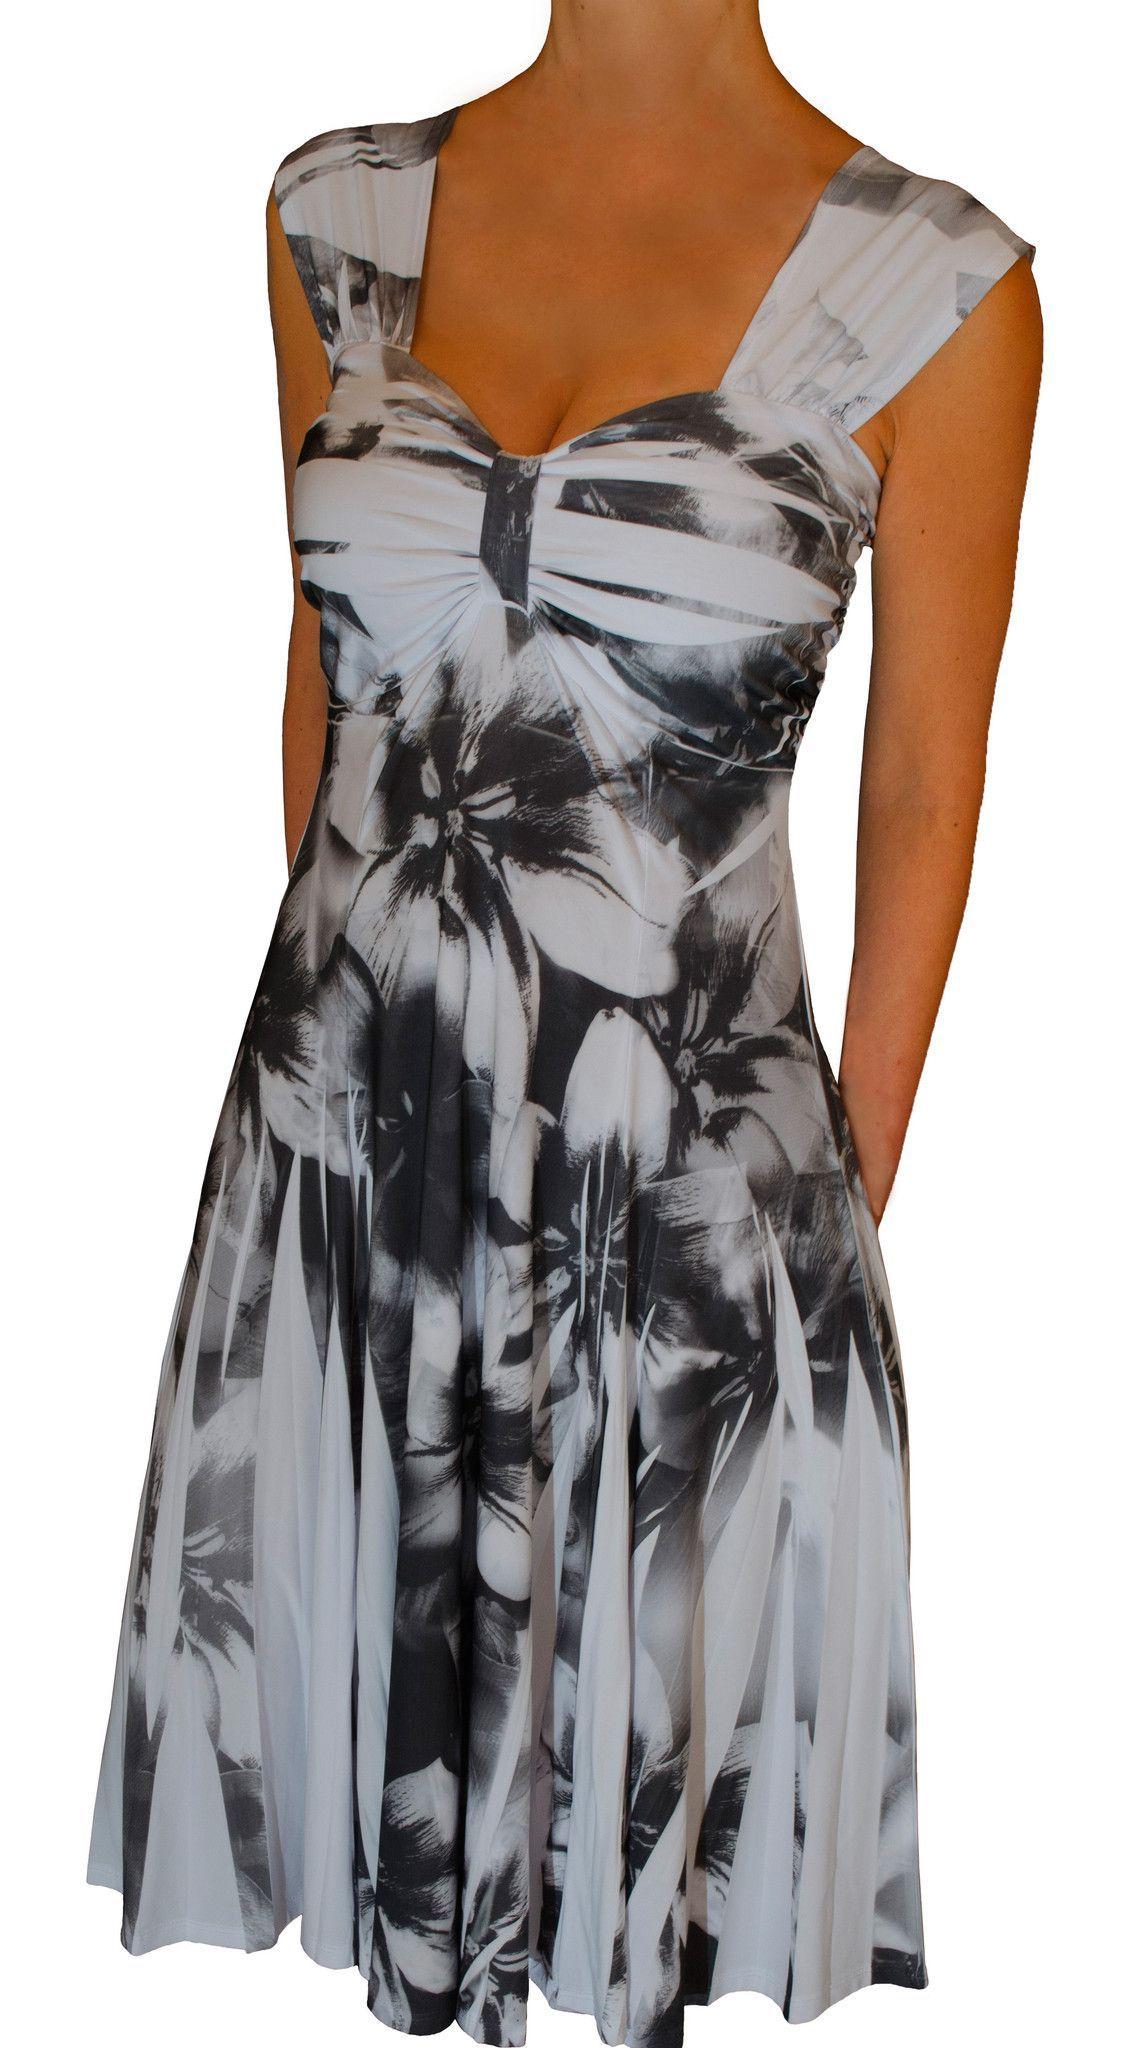 f8042e72d0 Funfash Plus Size Dress Black White Empire Waist Slimming Cocktail ...